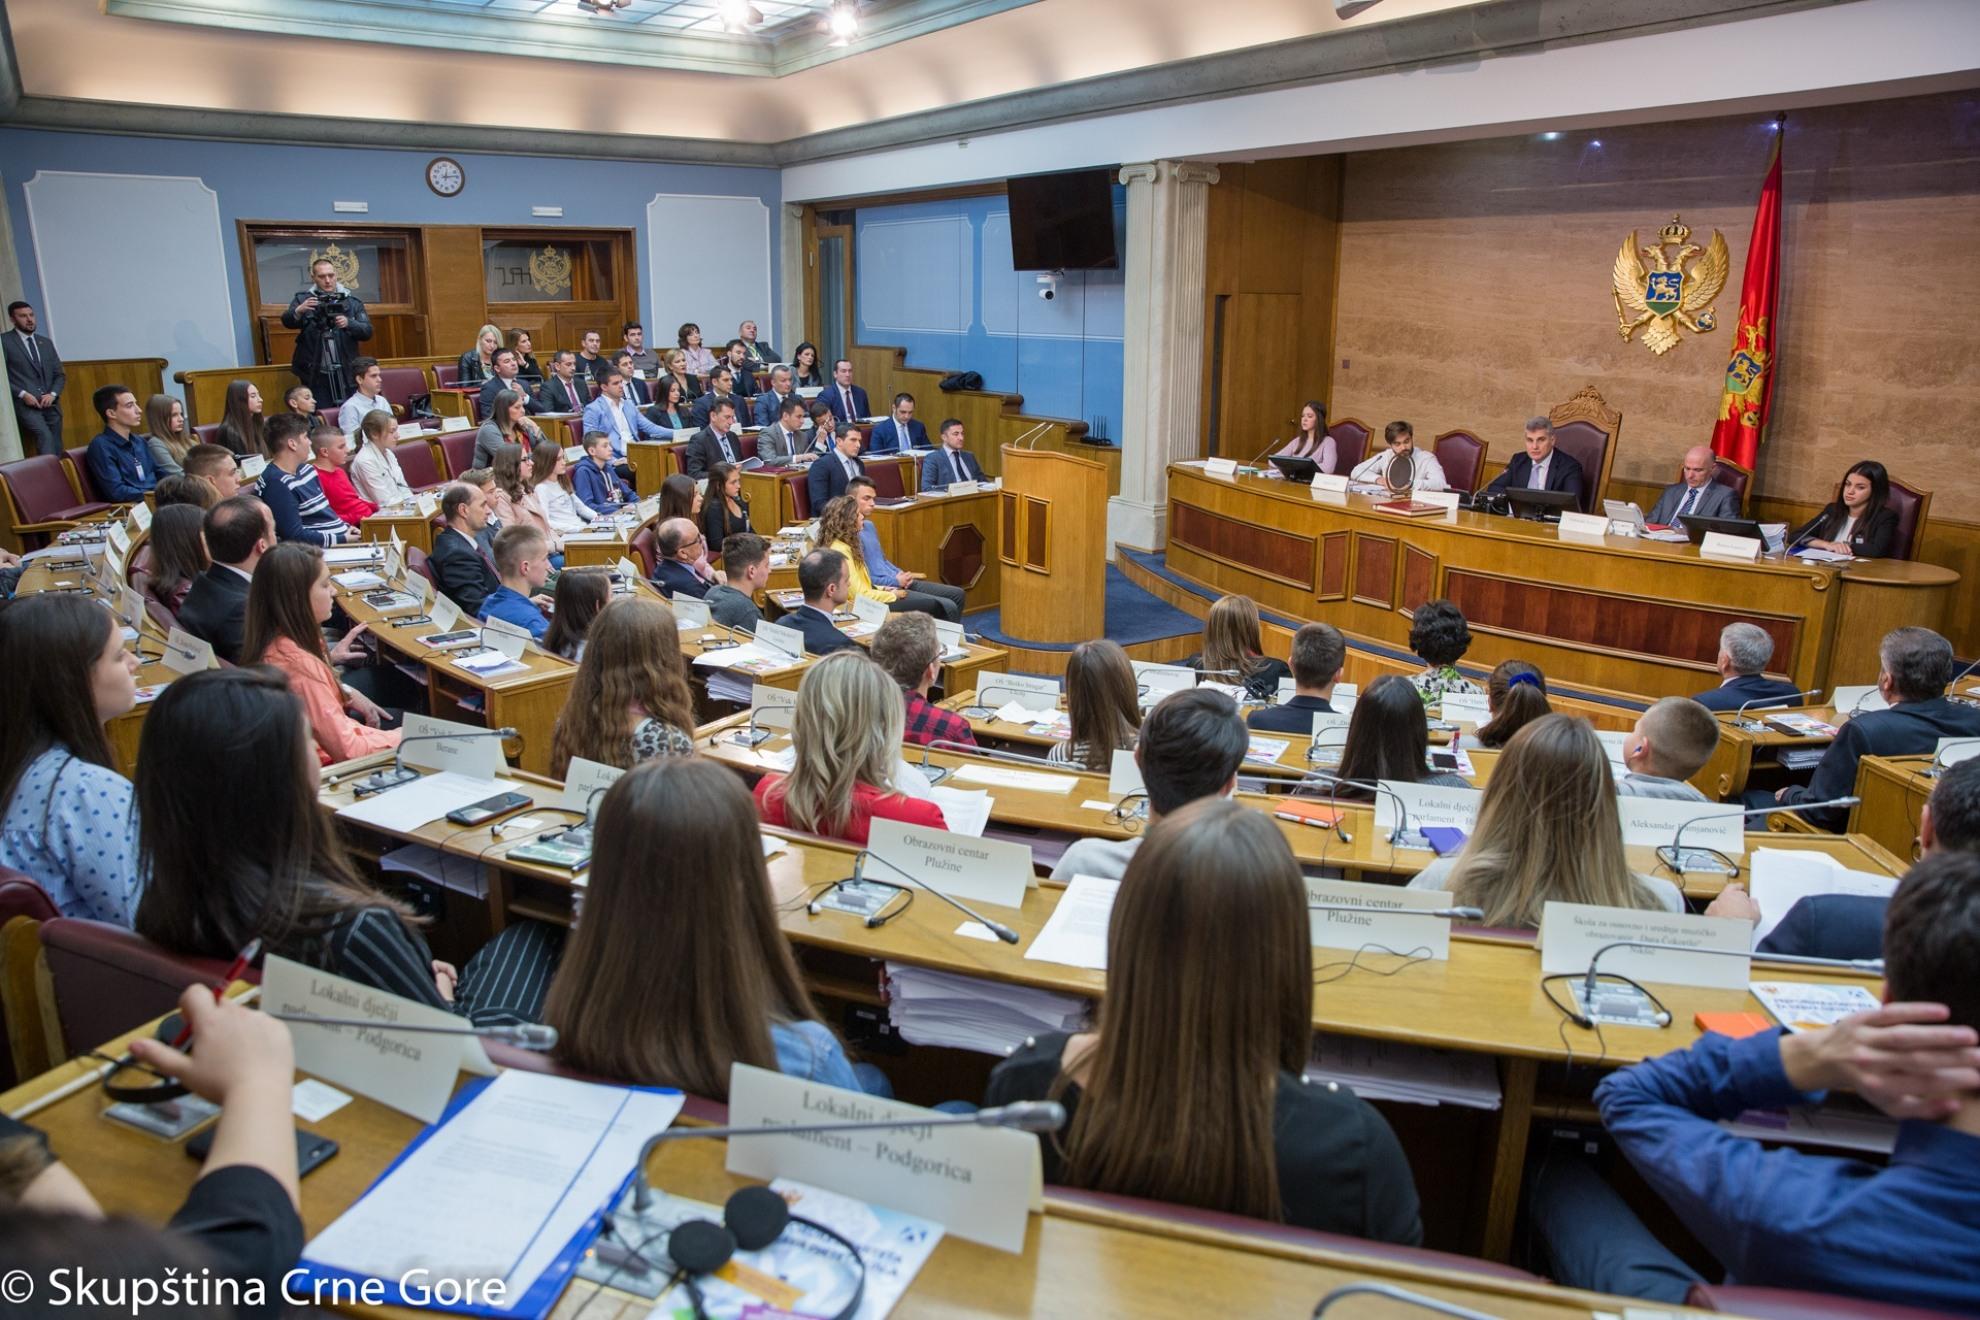 Danas jubilarno zasjedanje Dječjeg parlamenta